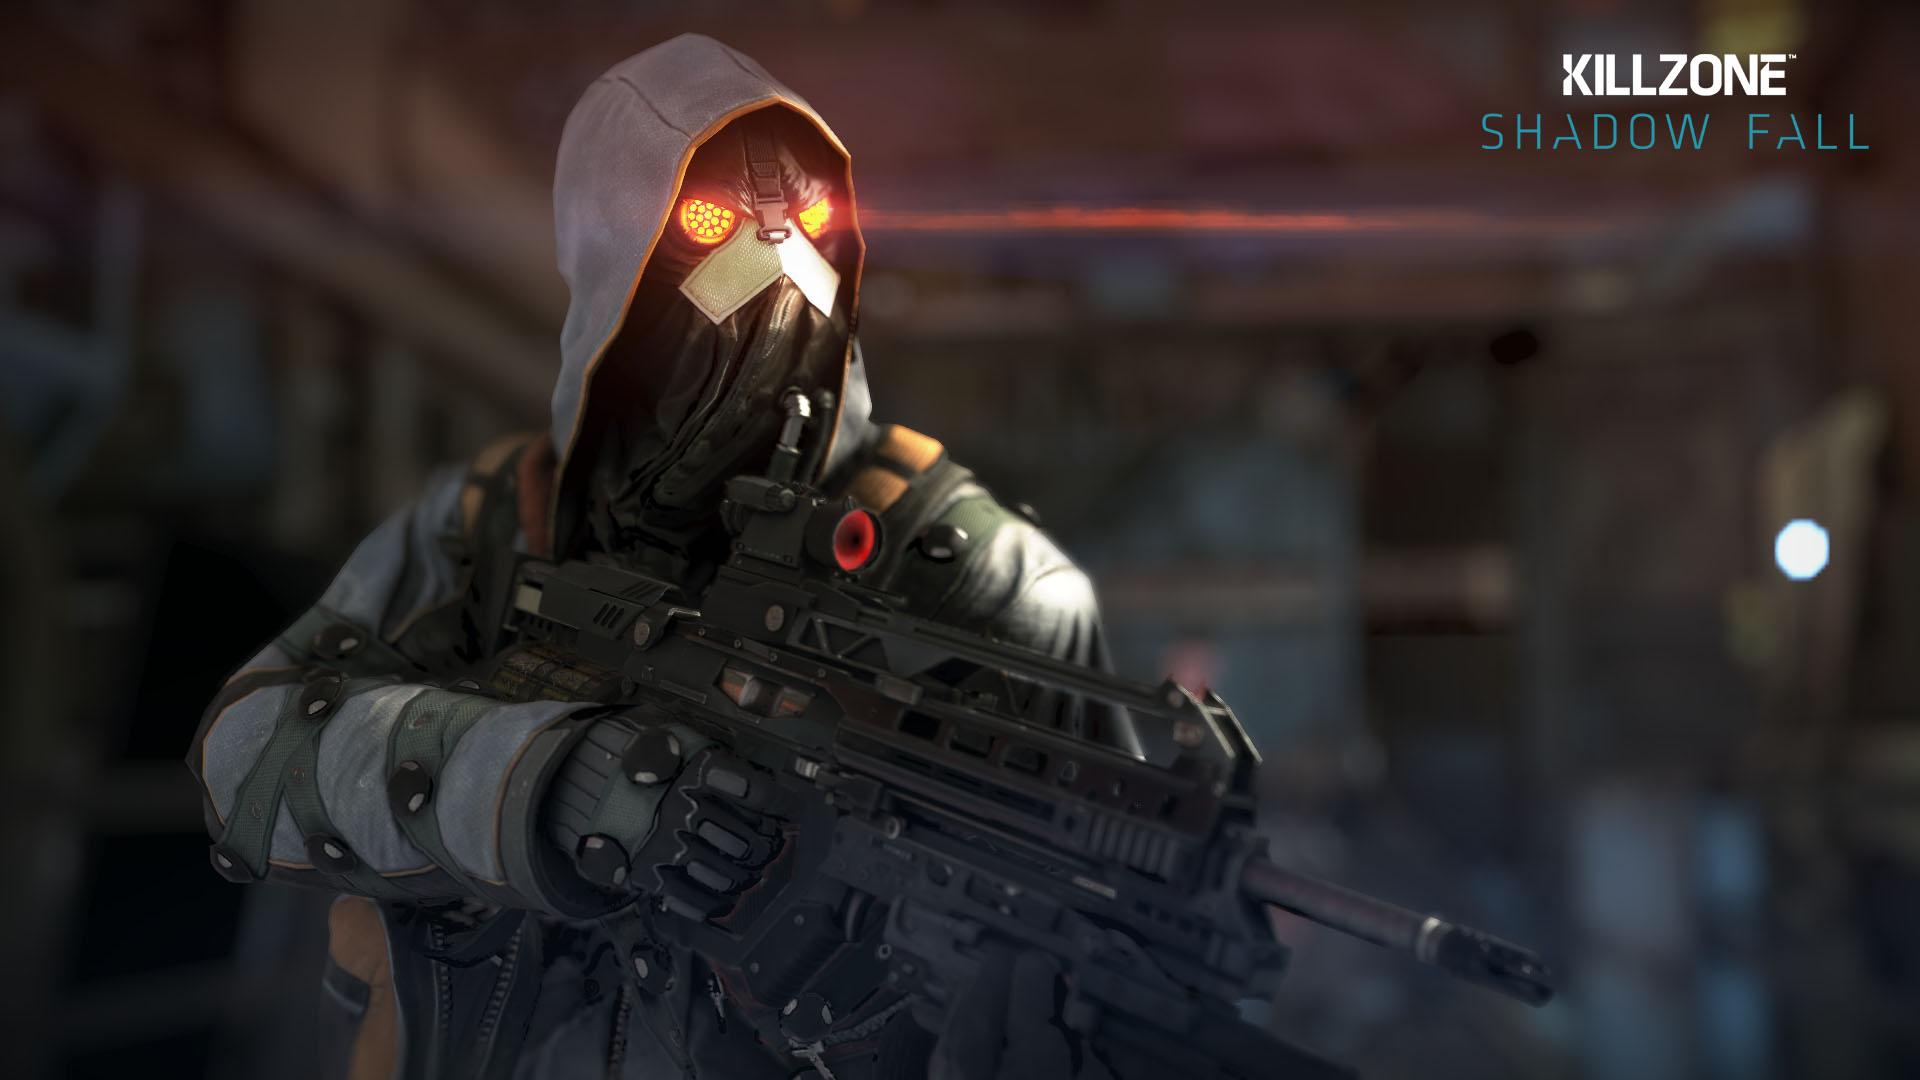 Killzone-ShadowFall PS4 Visuel 006